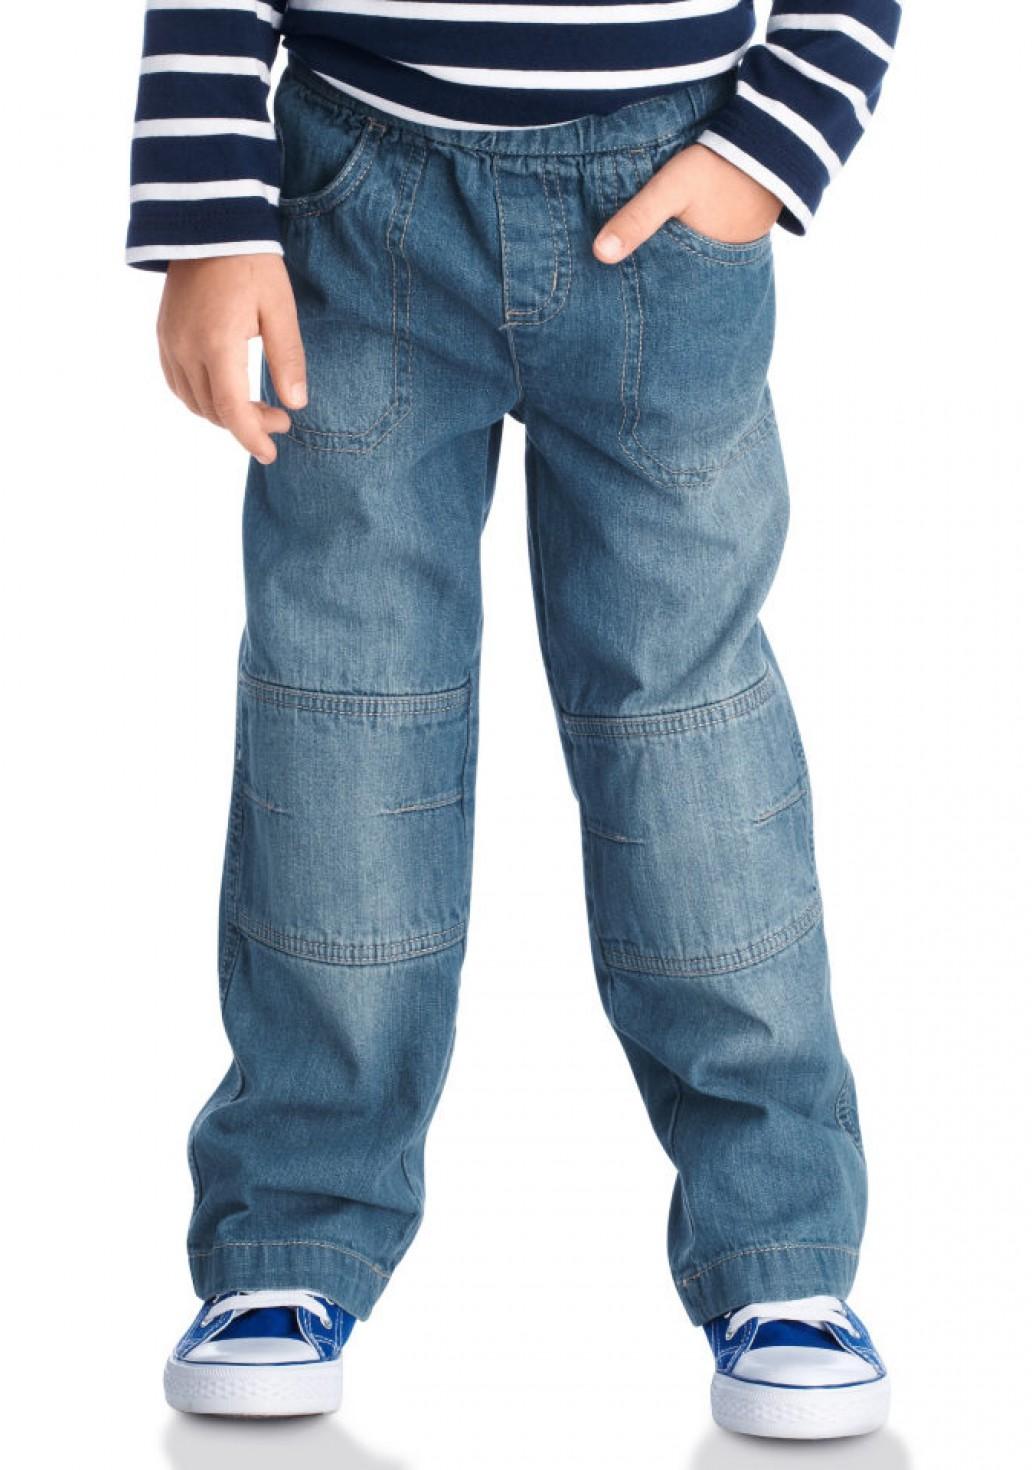 Снимает джинси фото 5 фотография